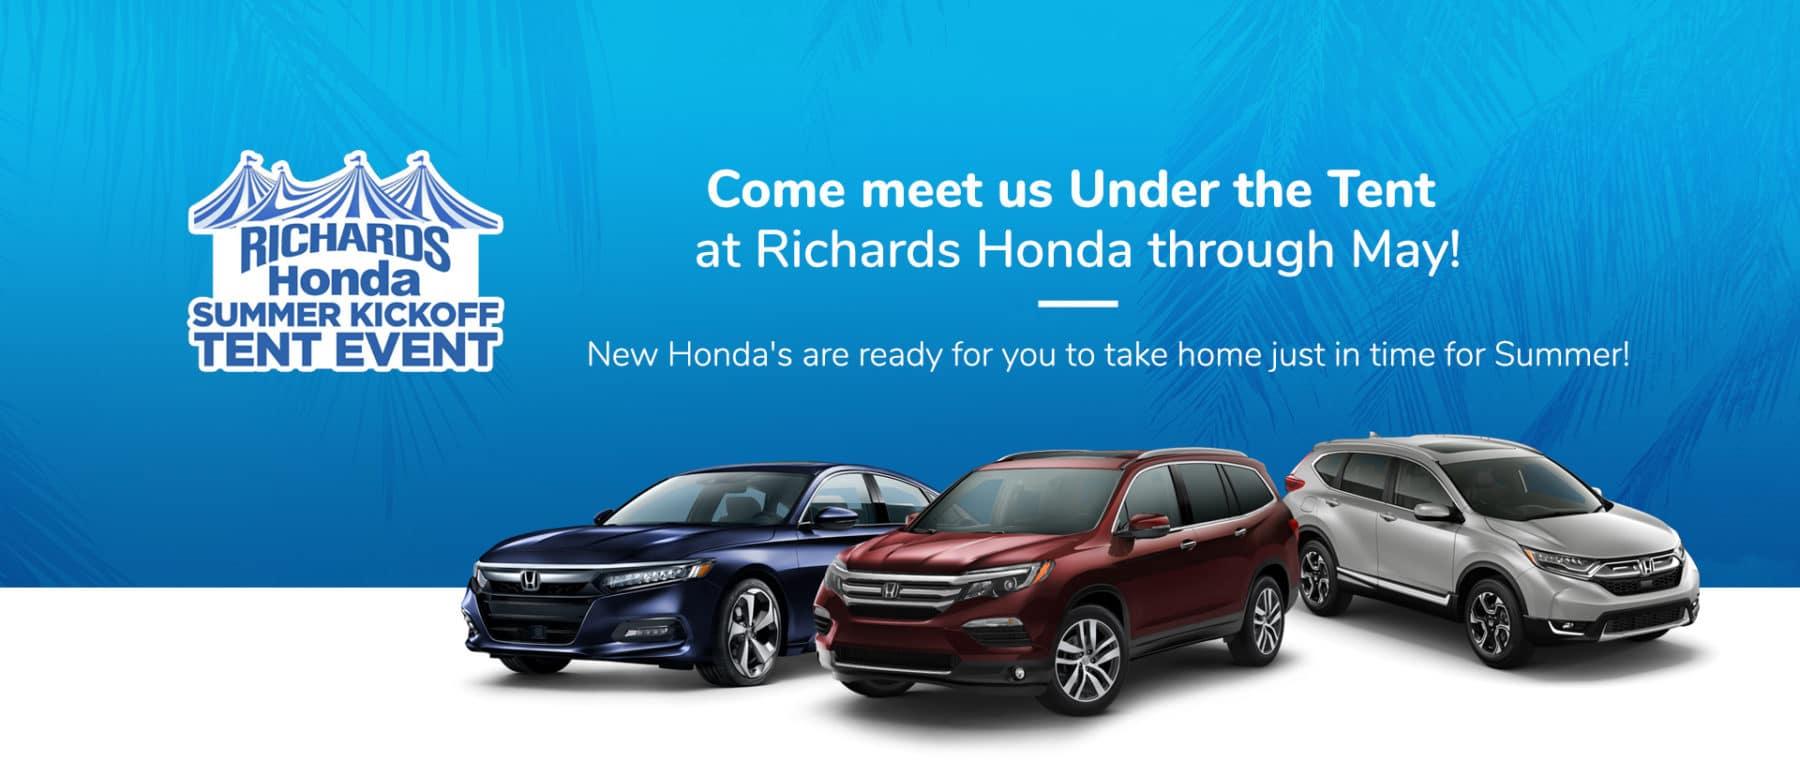 Richards Honda May Tent Sale